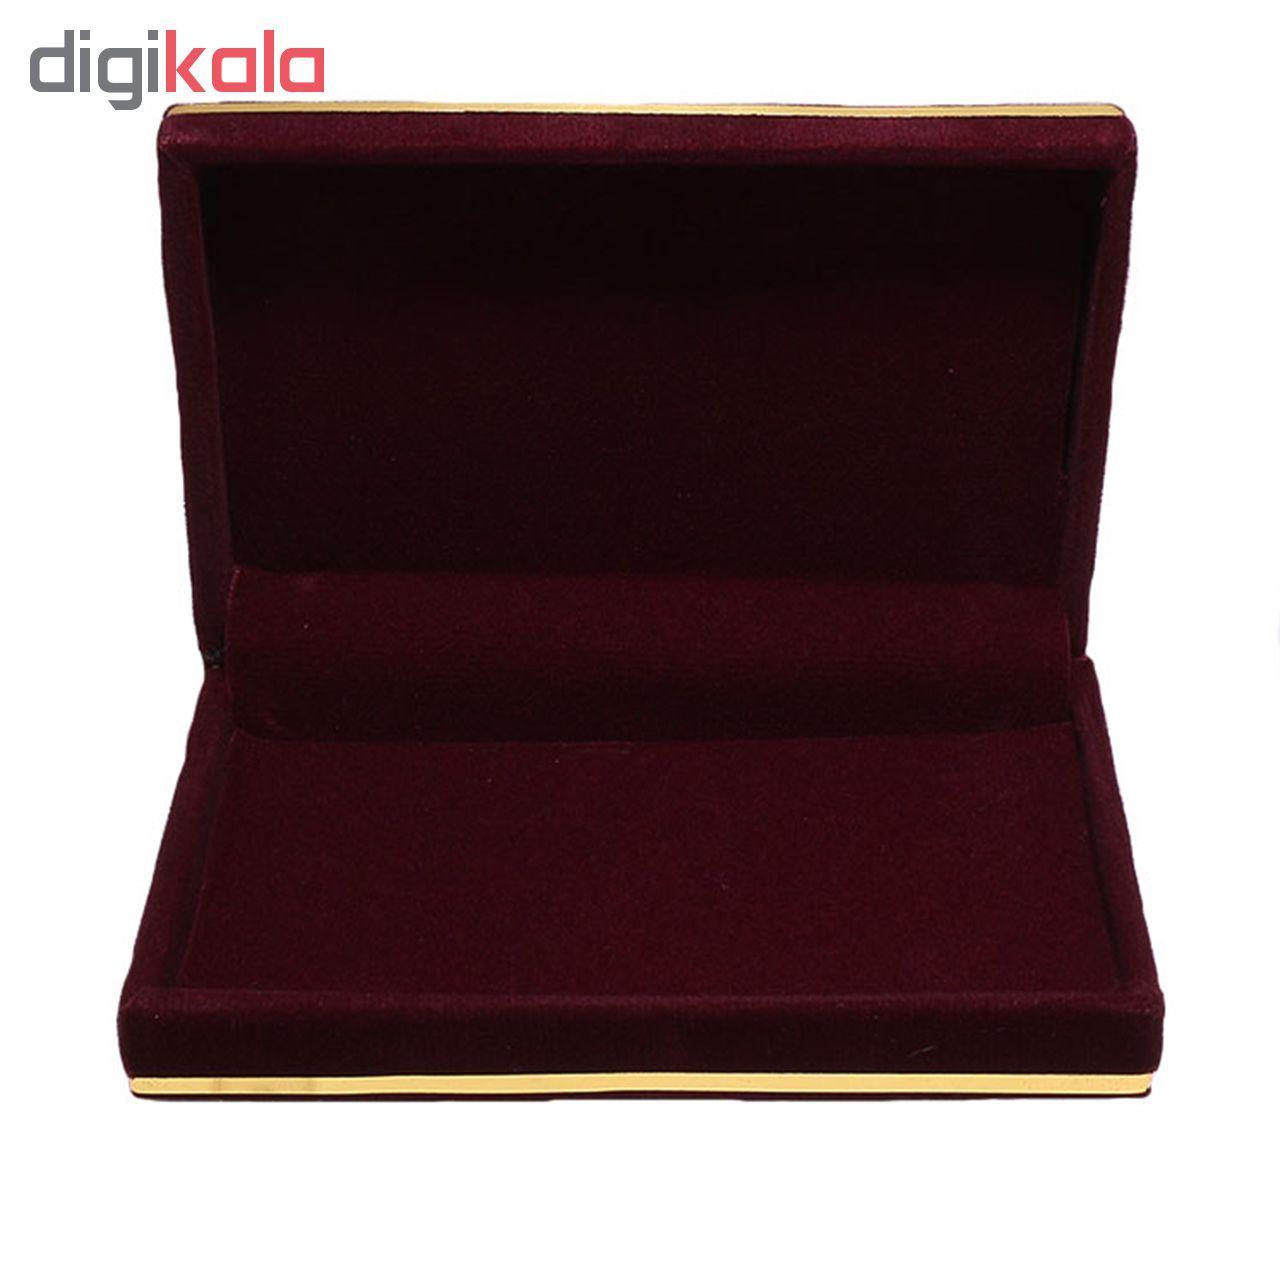 جعبه جواهرات کد b001 main 1 2